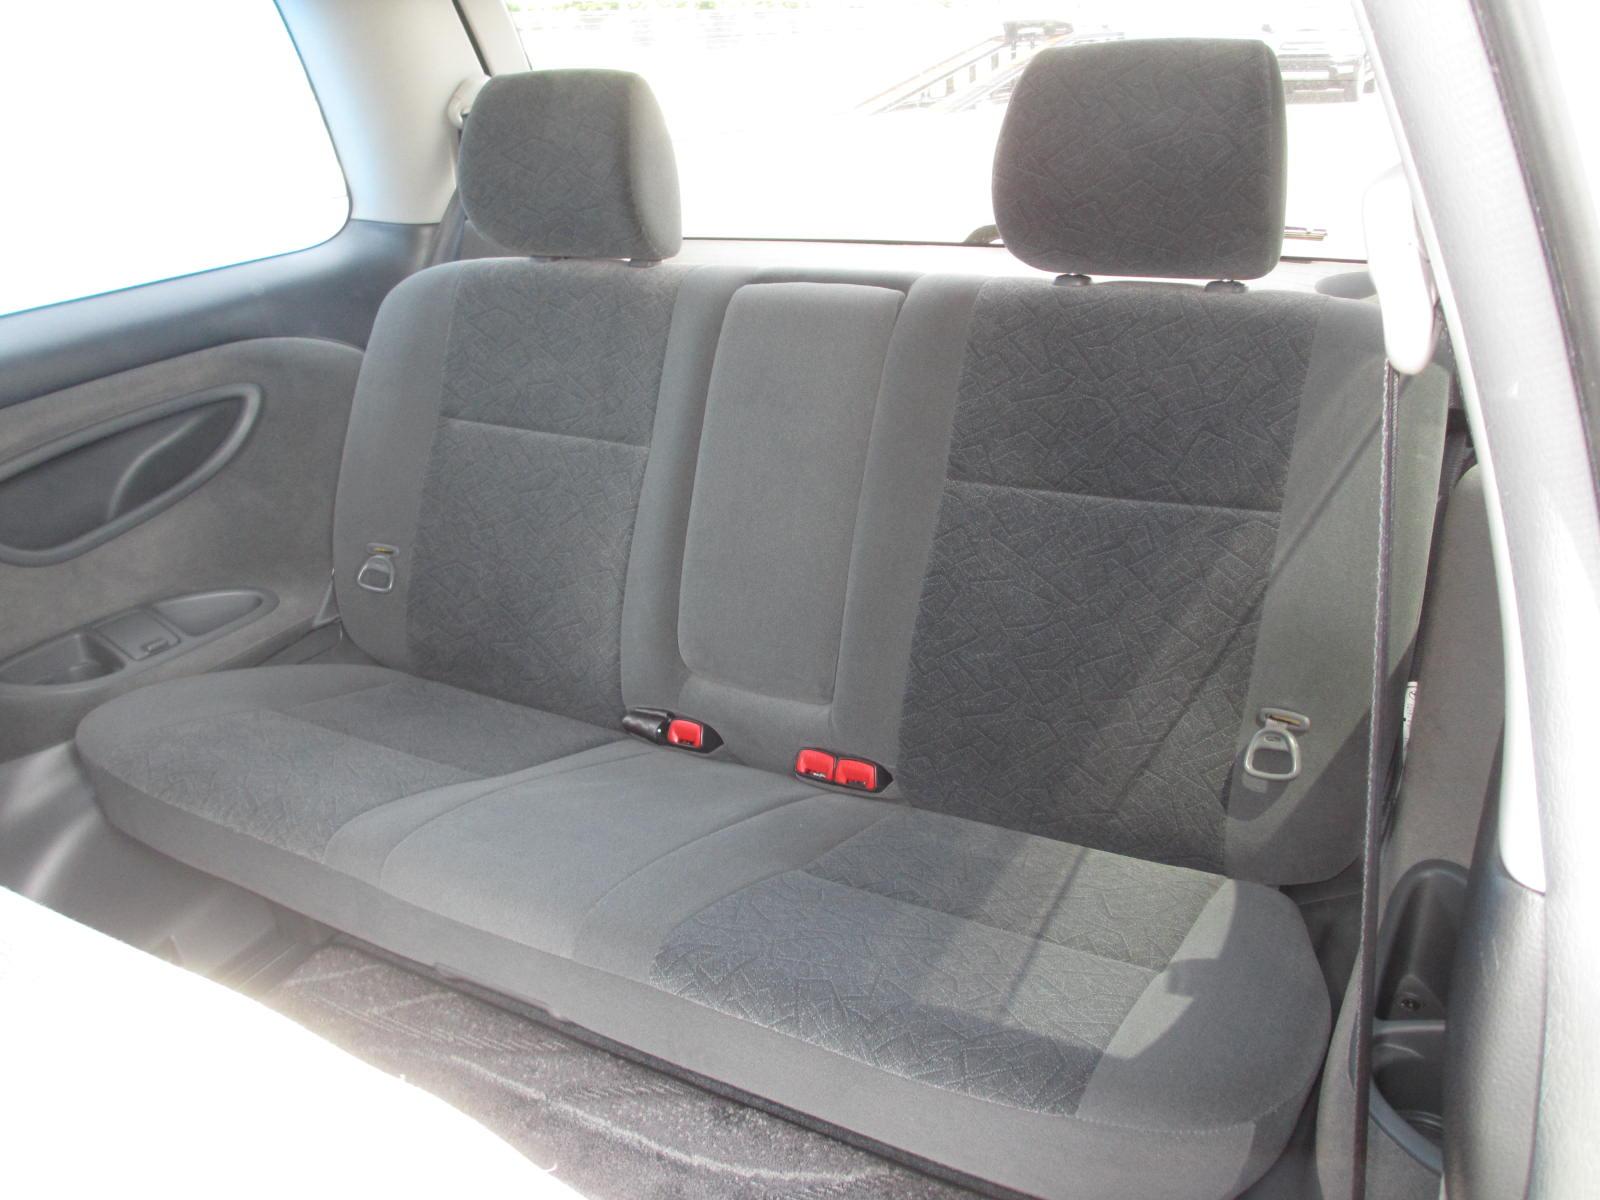 2003 Toyota Estima 3L Aeras S rear seats